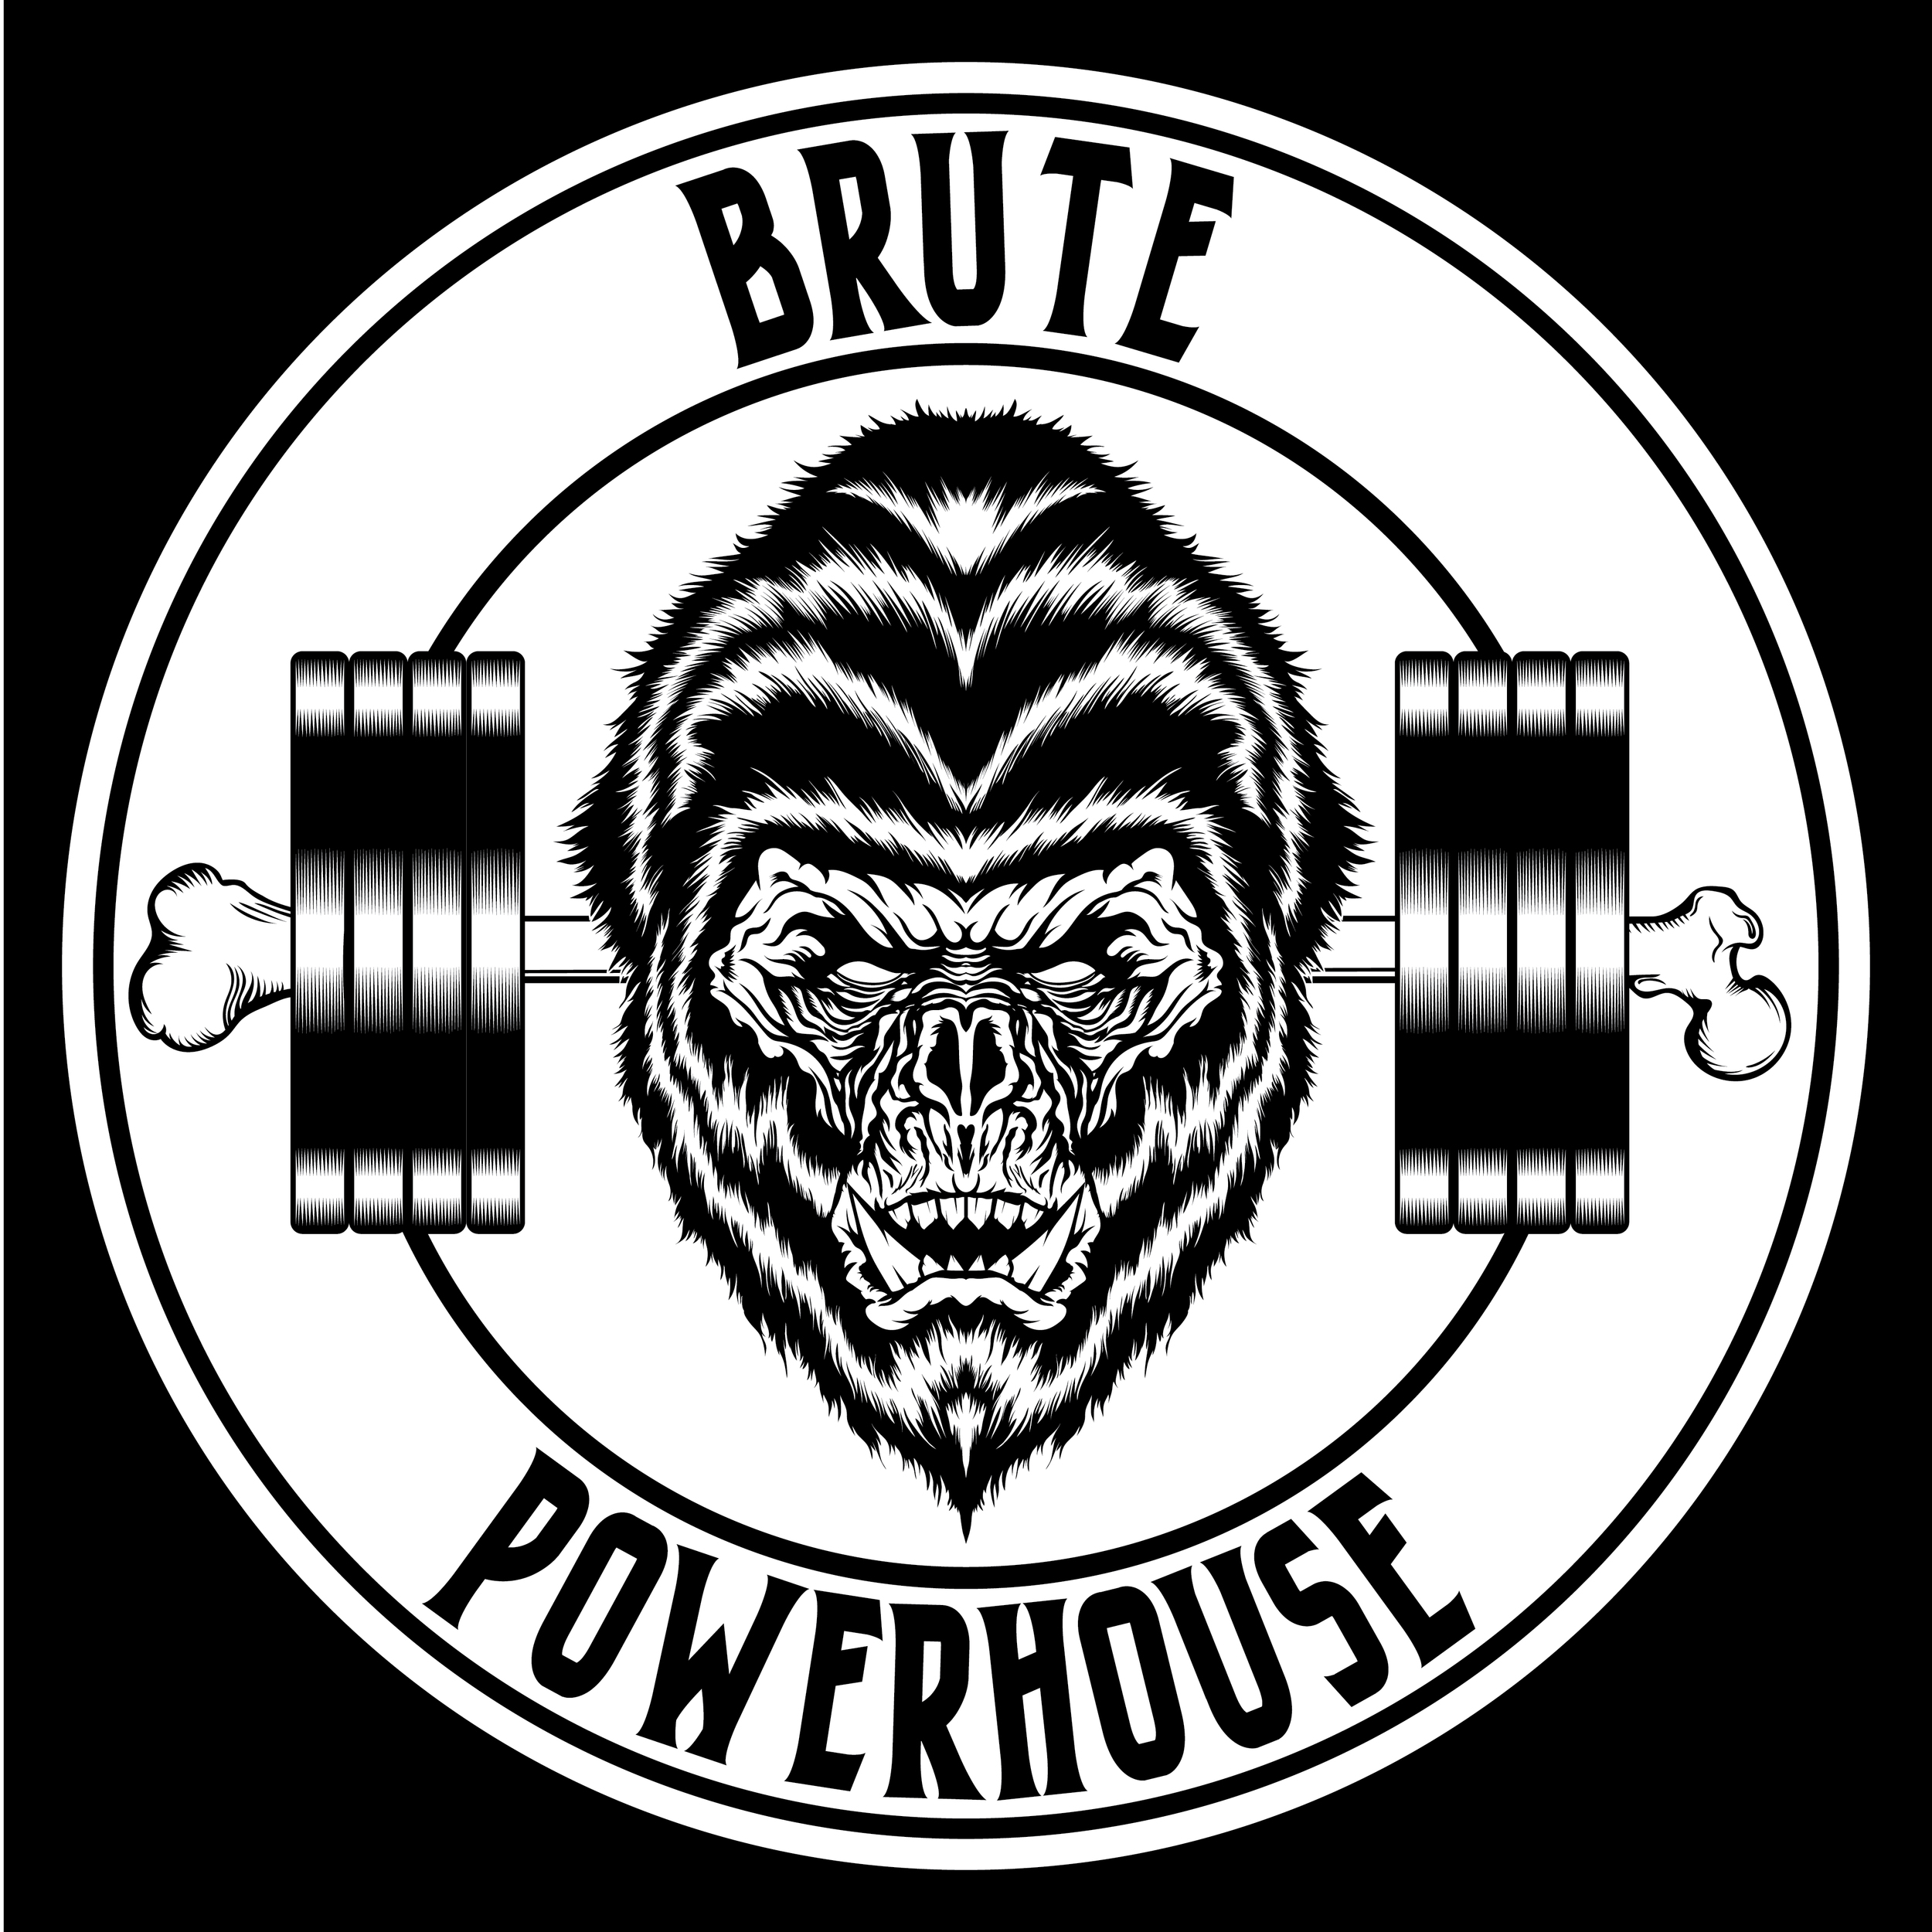 brute-powerhouse-illustration-logo-adobe-illustrator-vector-art-artist-gorilla-monster-ape-savage-gym-crossfit-powerlifting-roberto-orozco-design-graphic-designer-black-white-circle-logos-1